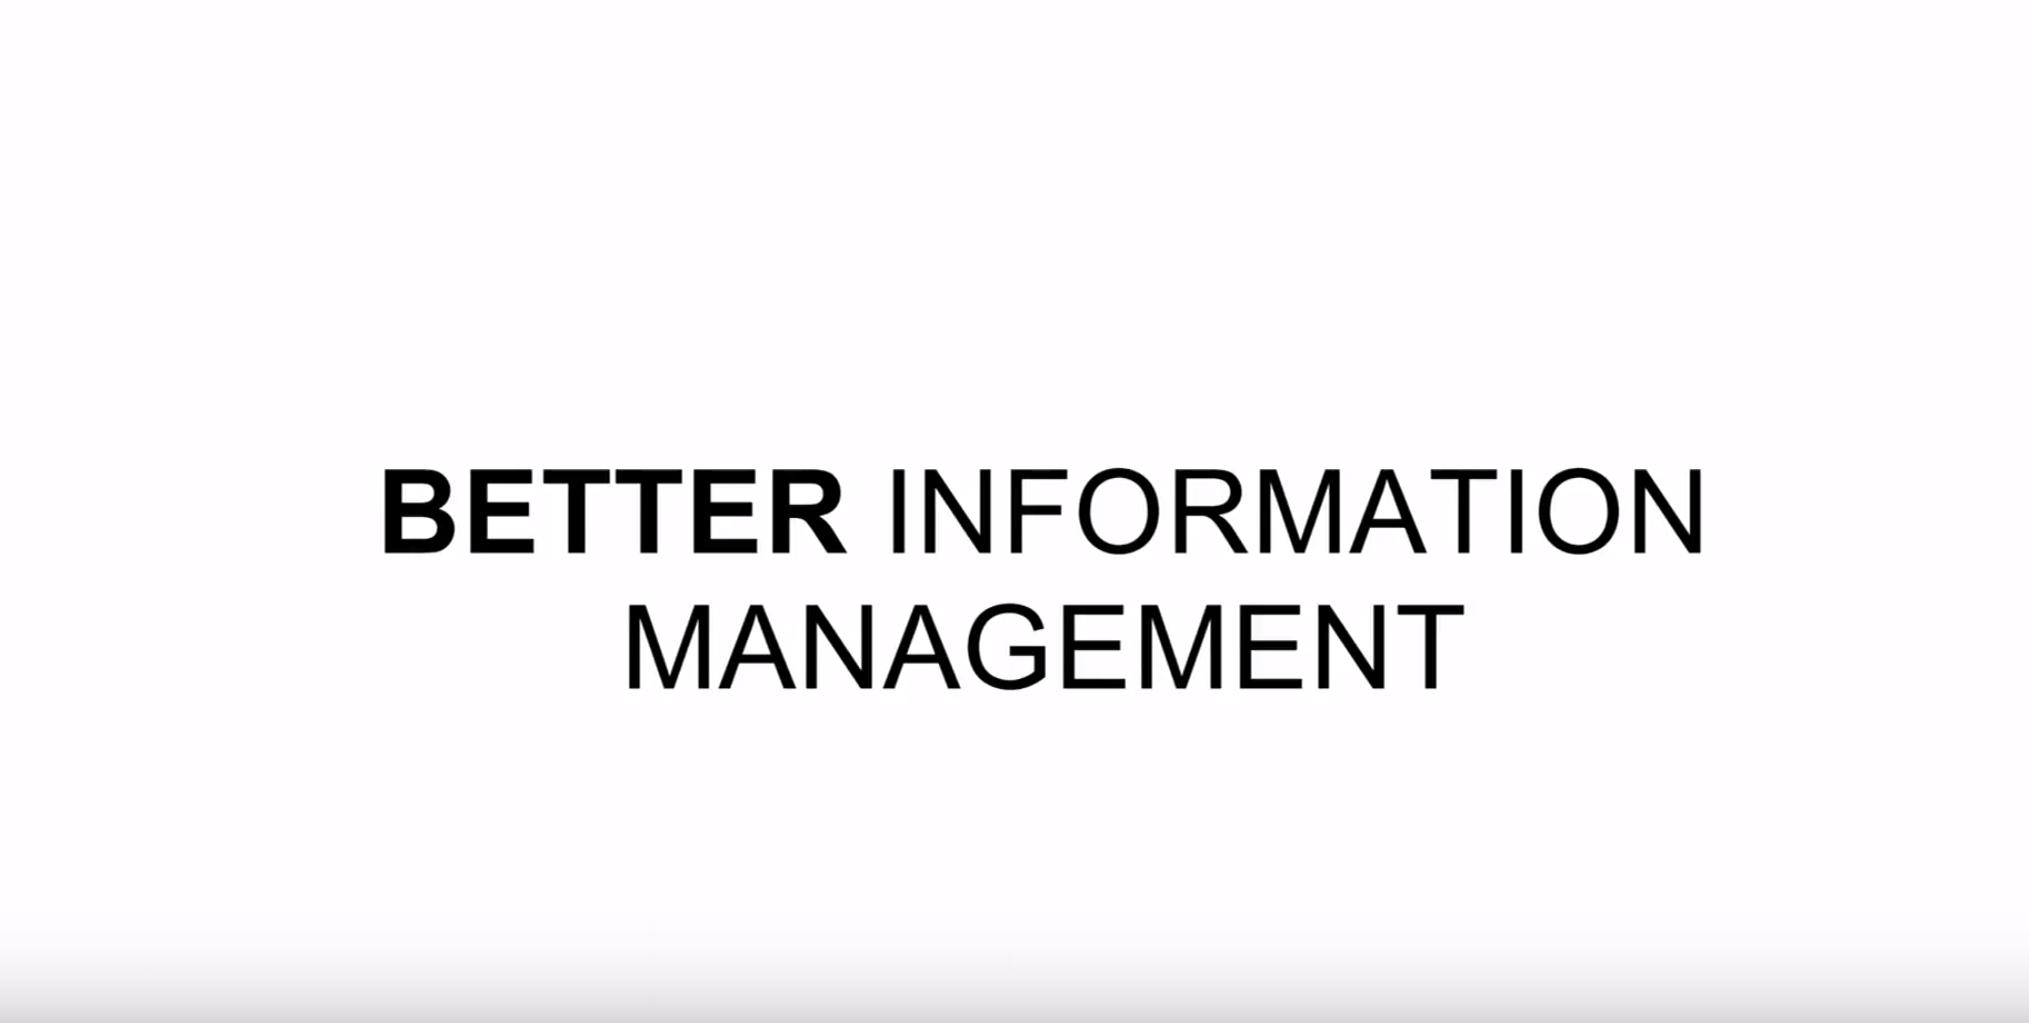 ns-better-information-management